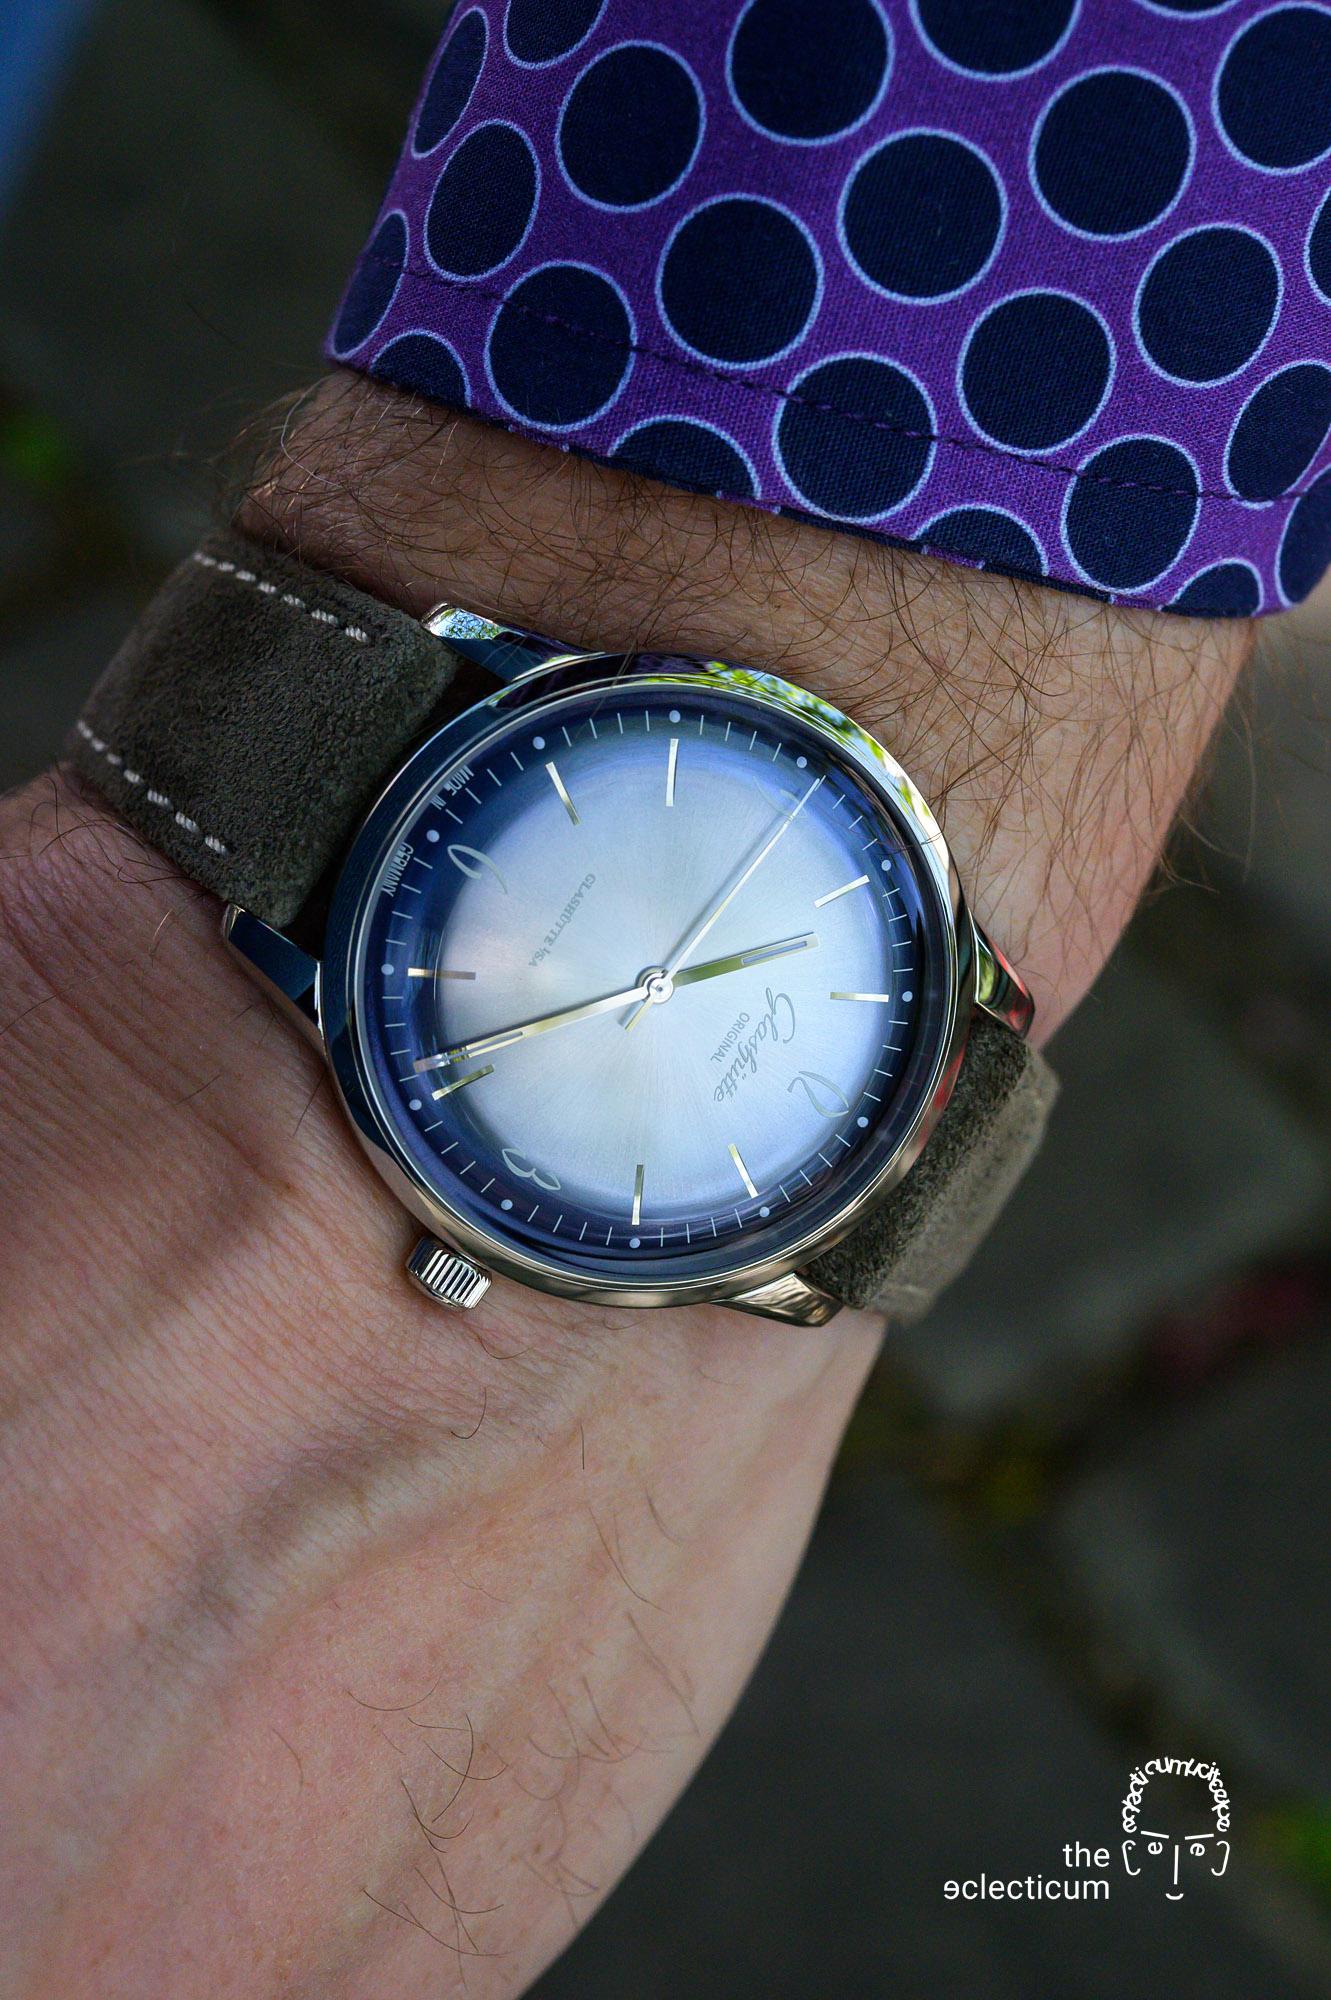 Glashütte Original Sixties Annual Edition 2020 Glacier Blue Time Only wristshot